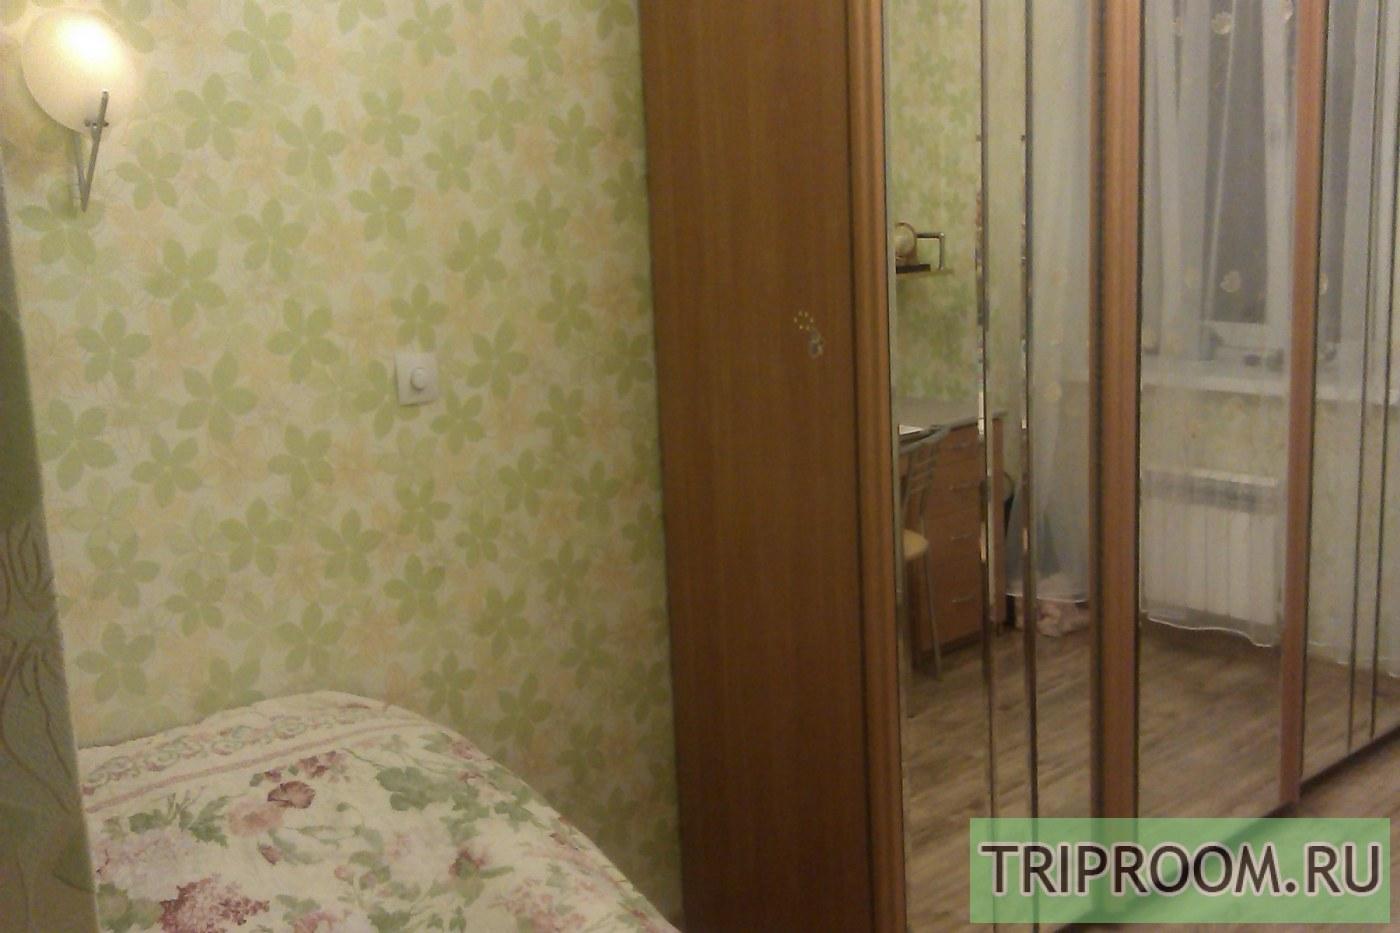 3-комнатная квартира посуточно (вариант № 39631), ул. Кирова улица, фото № 9